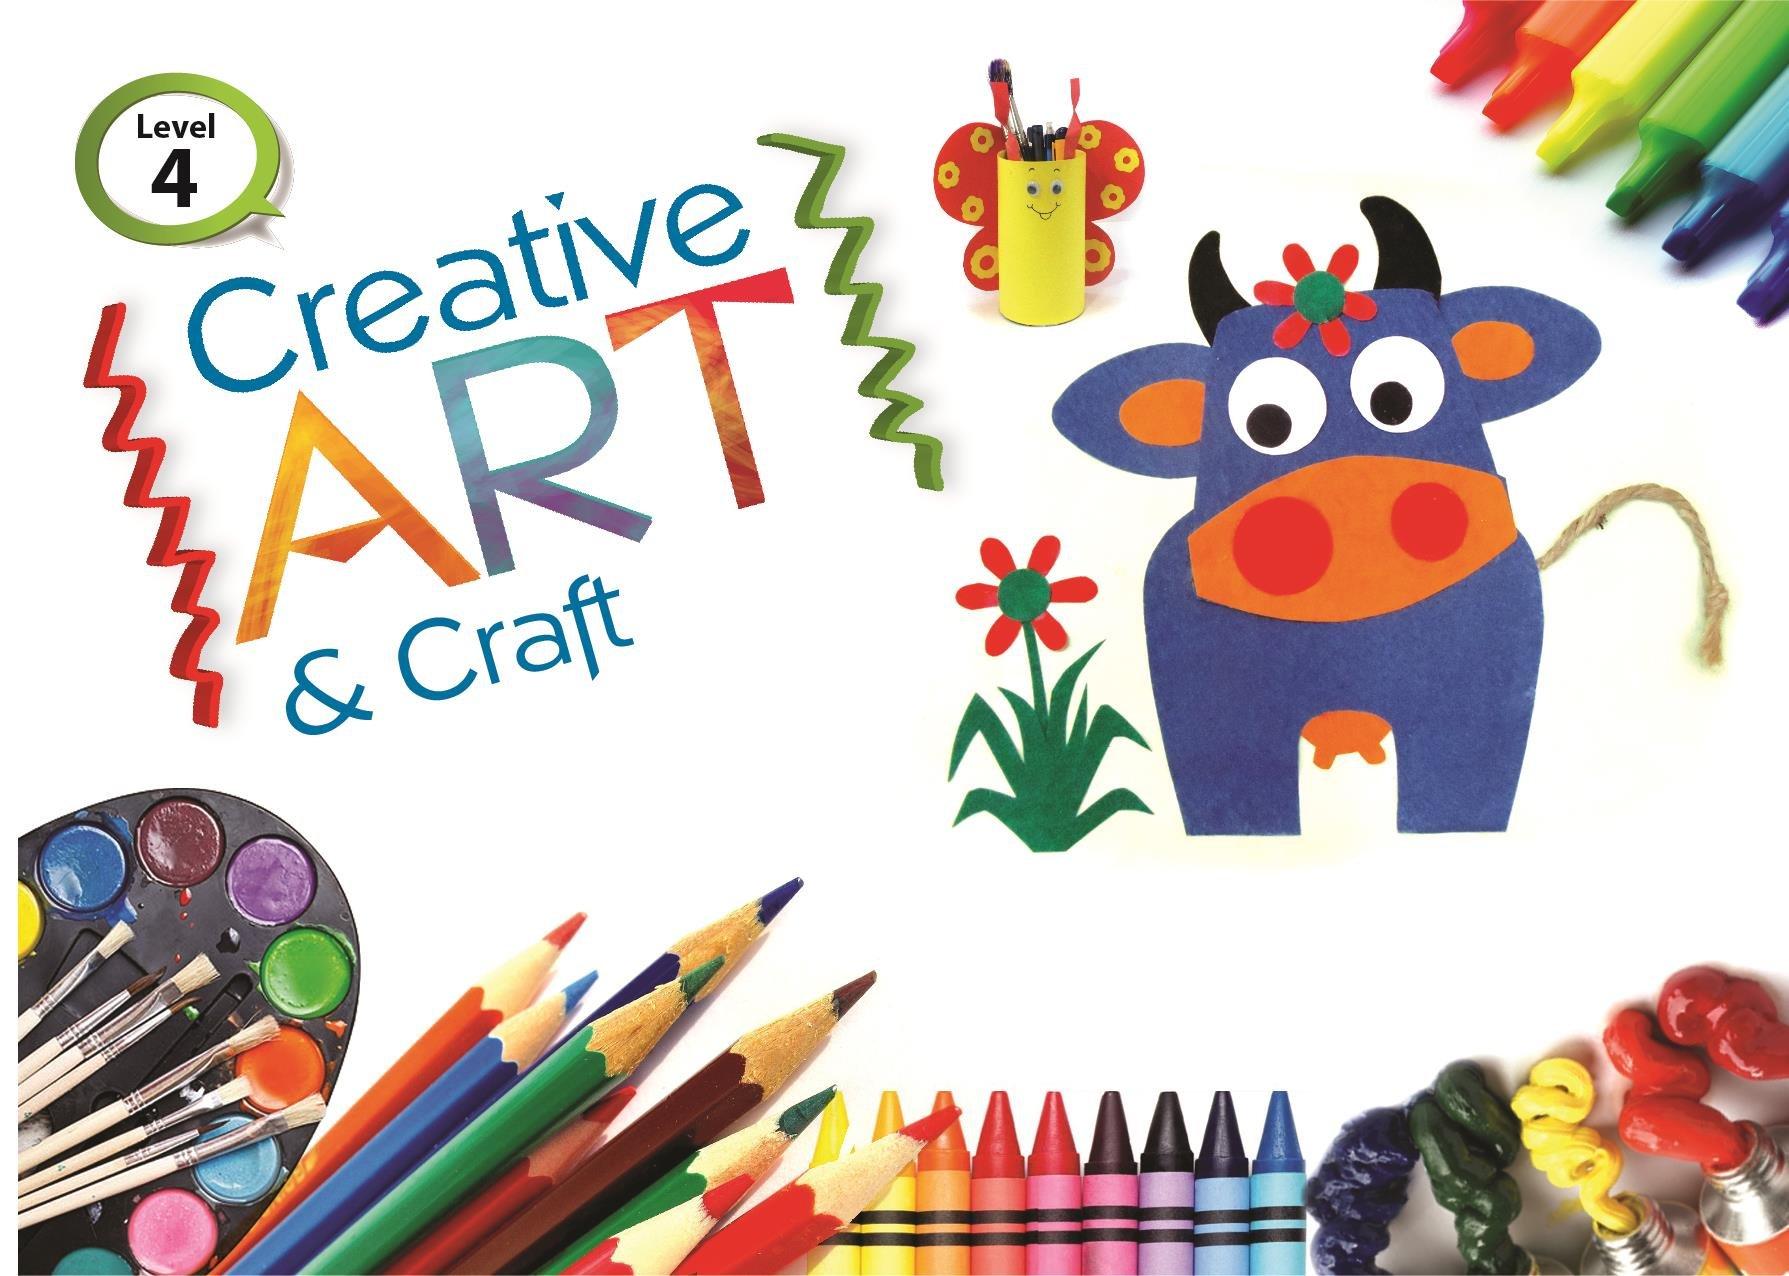 CREATIVE ART: LEVEL 4 - VOL. 150